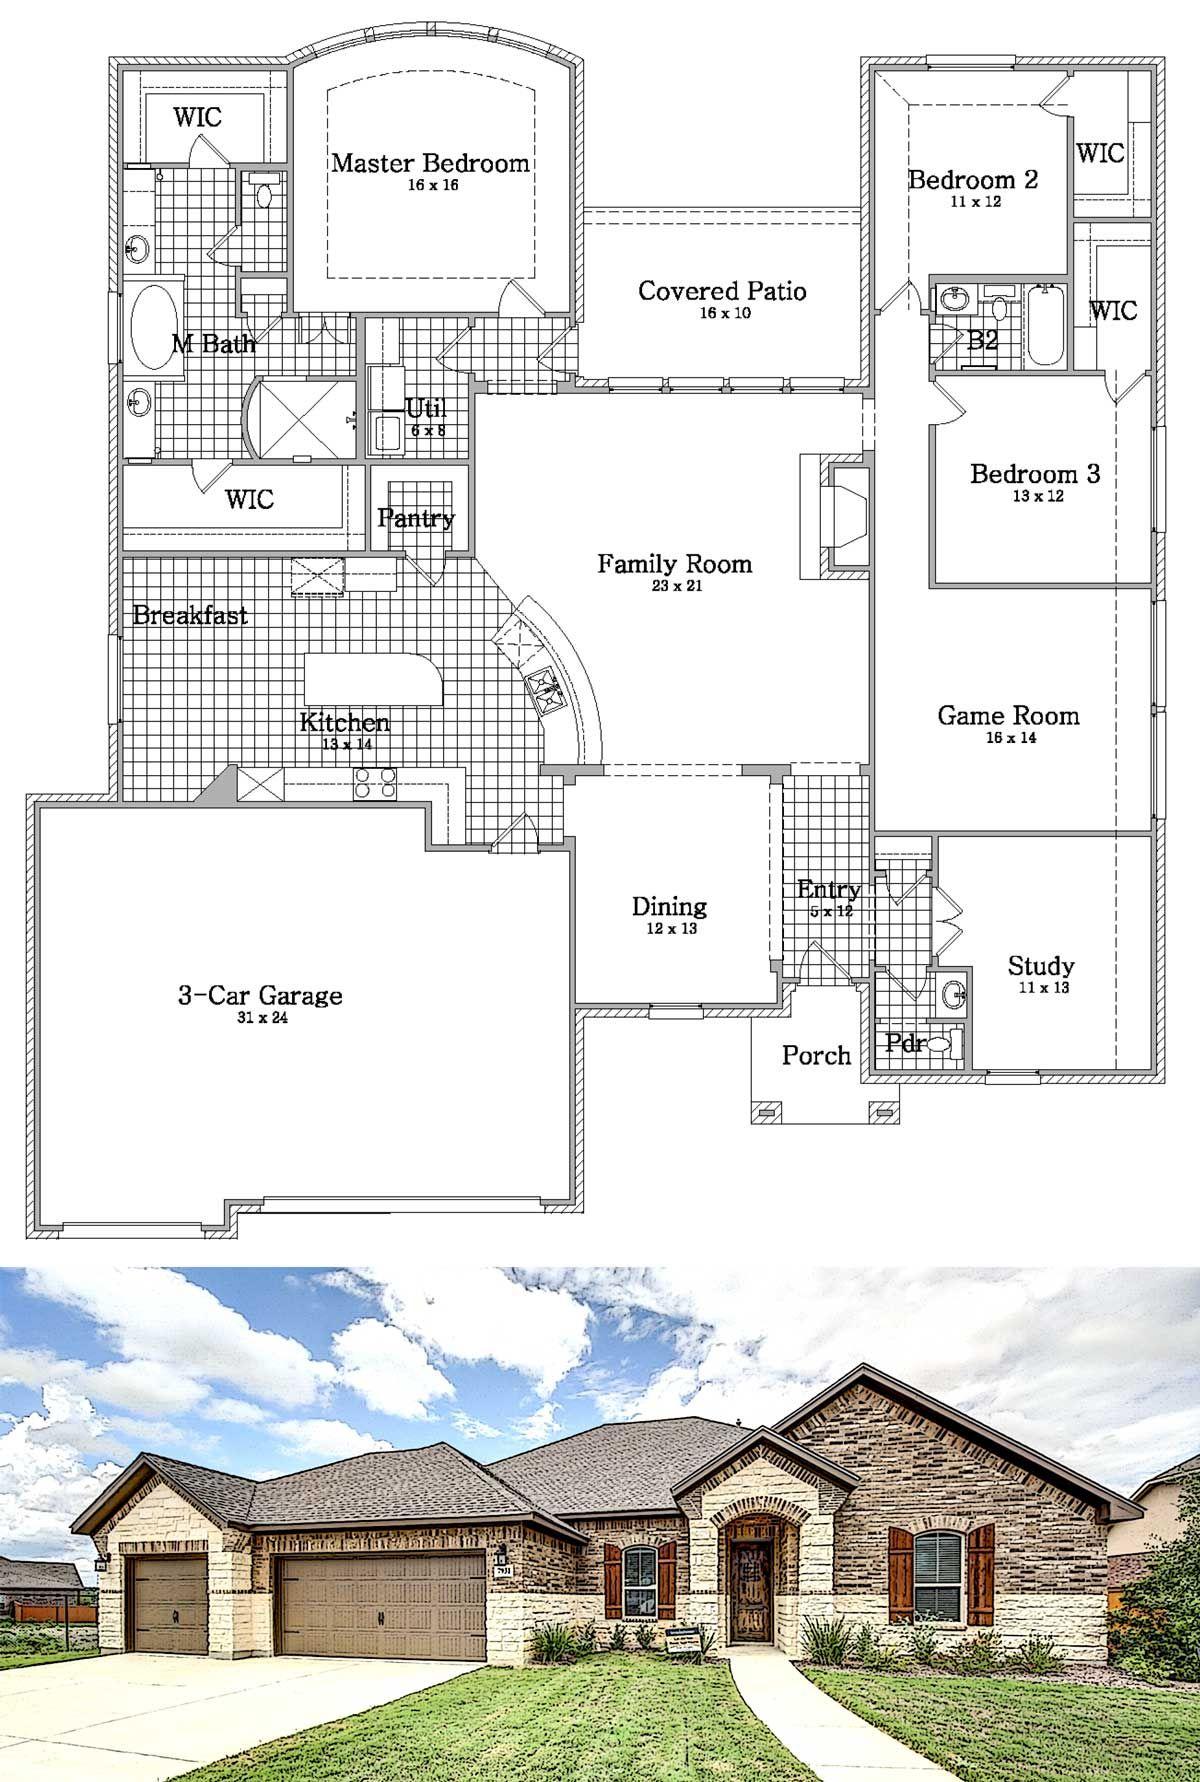 Savona Plan With Sunroom Option Imagine Homes Is A Green Home Builder In San Antonio Texas San Antonio Tx San Antonio Texas Sunroom Designs